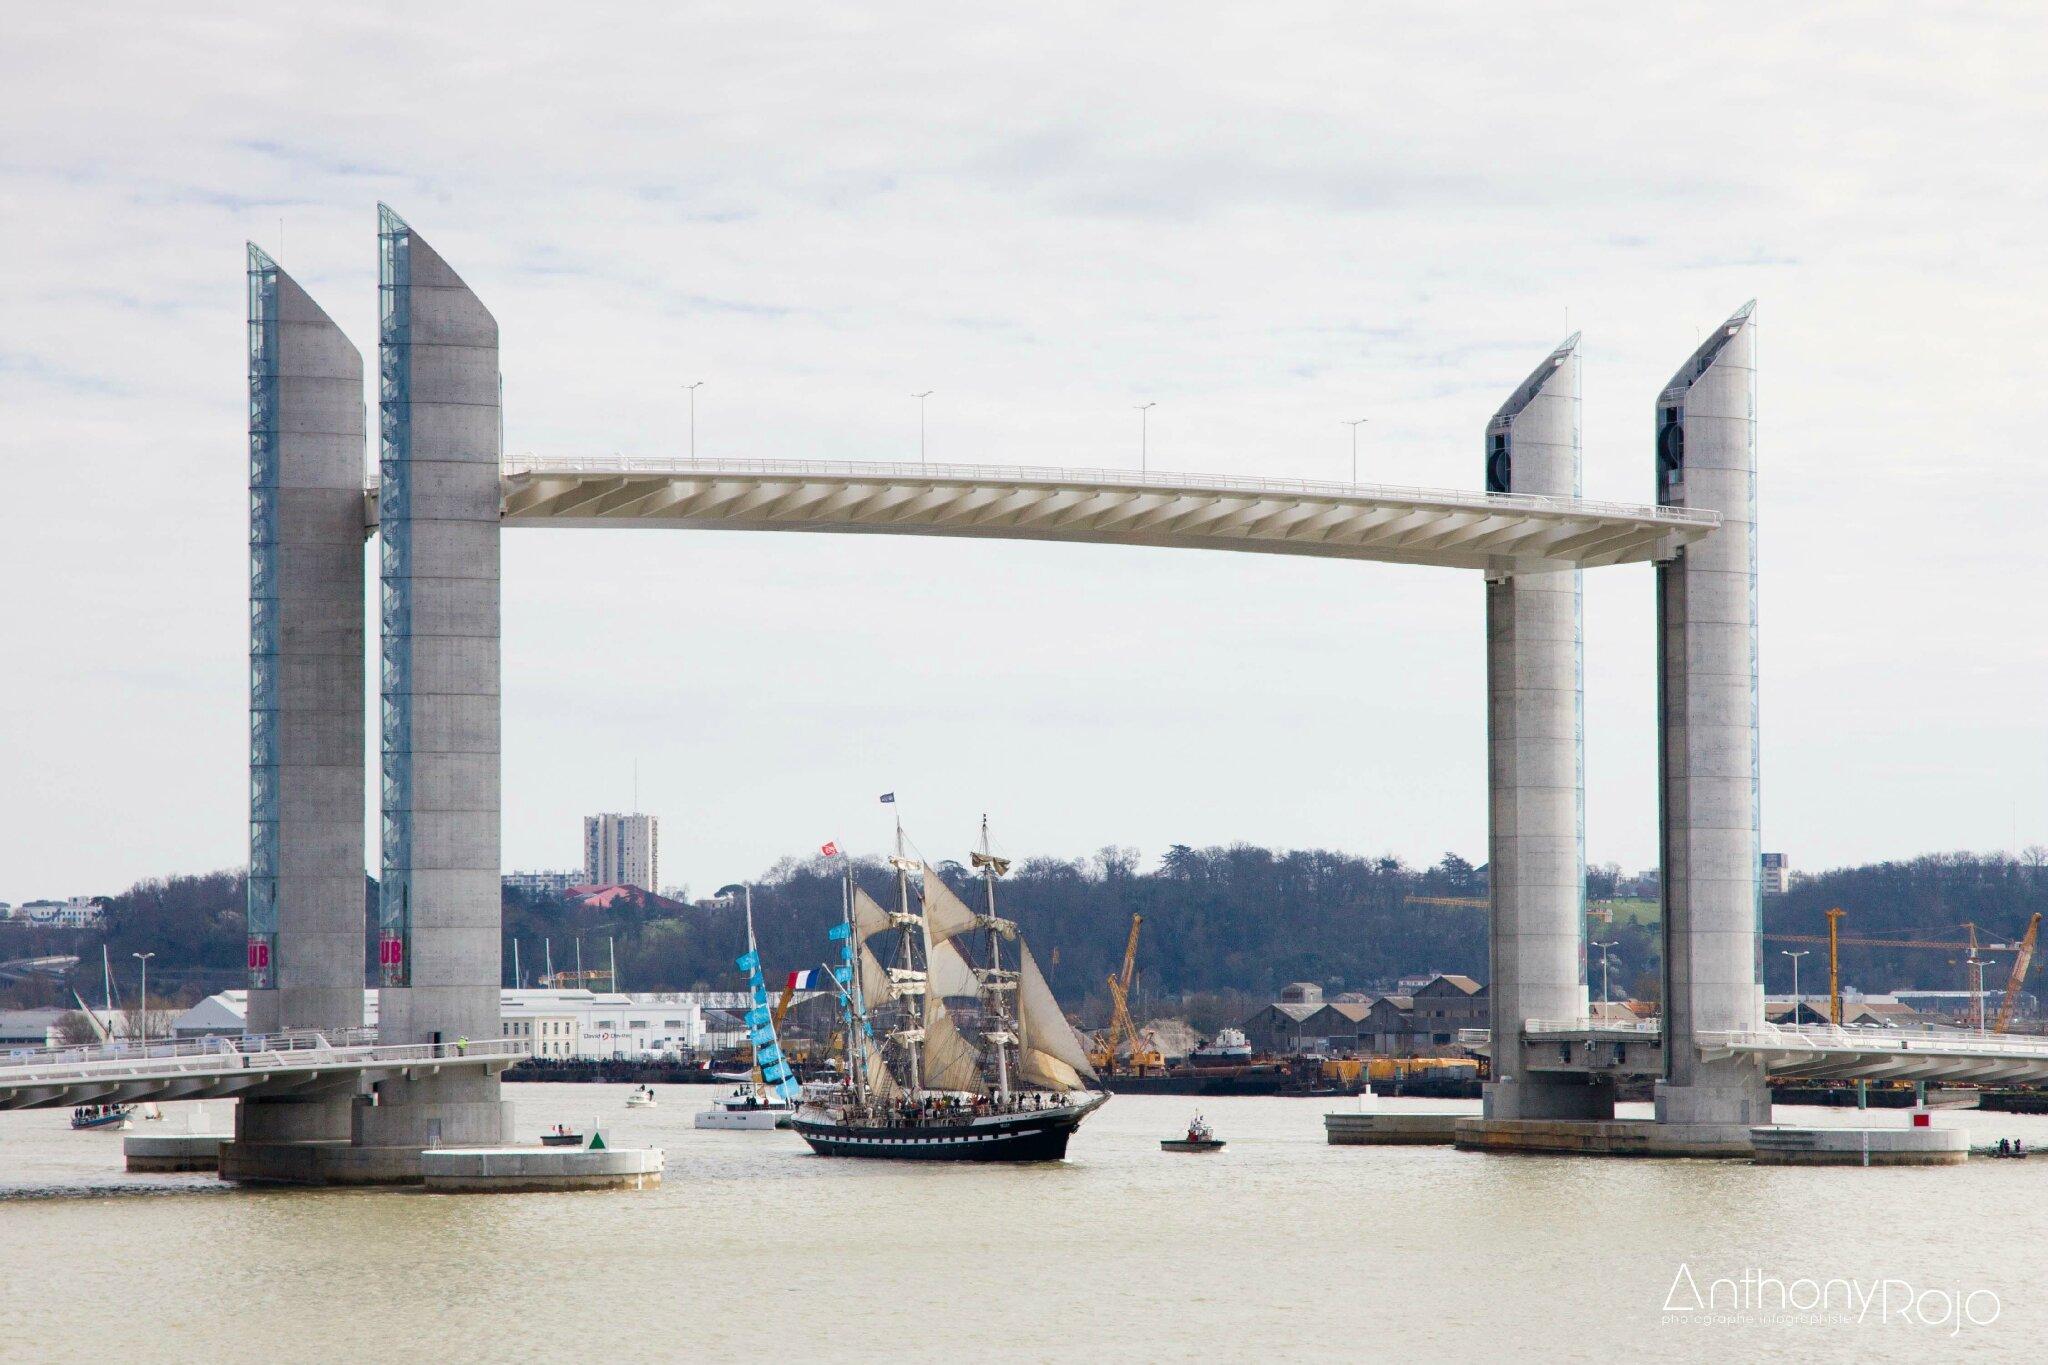 Reportage photo il tait un pont inauguration du pont jacques chaban del - Pont chaban delmas inauguration ...